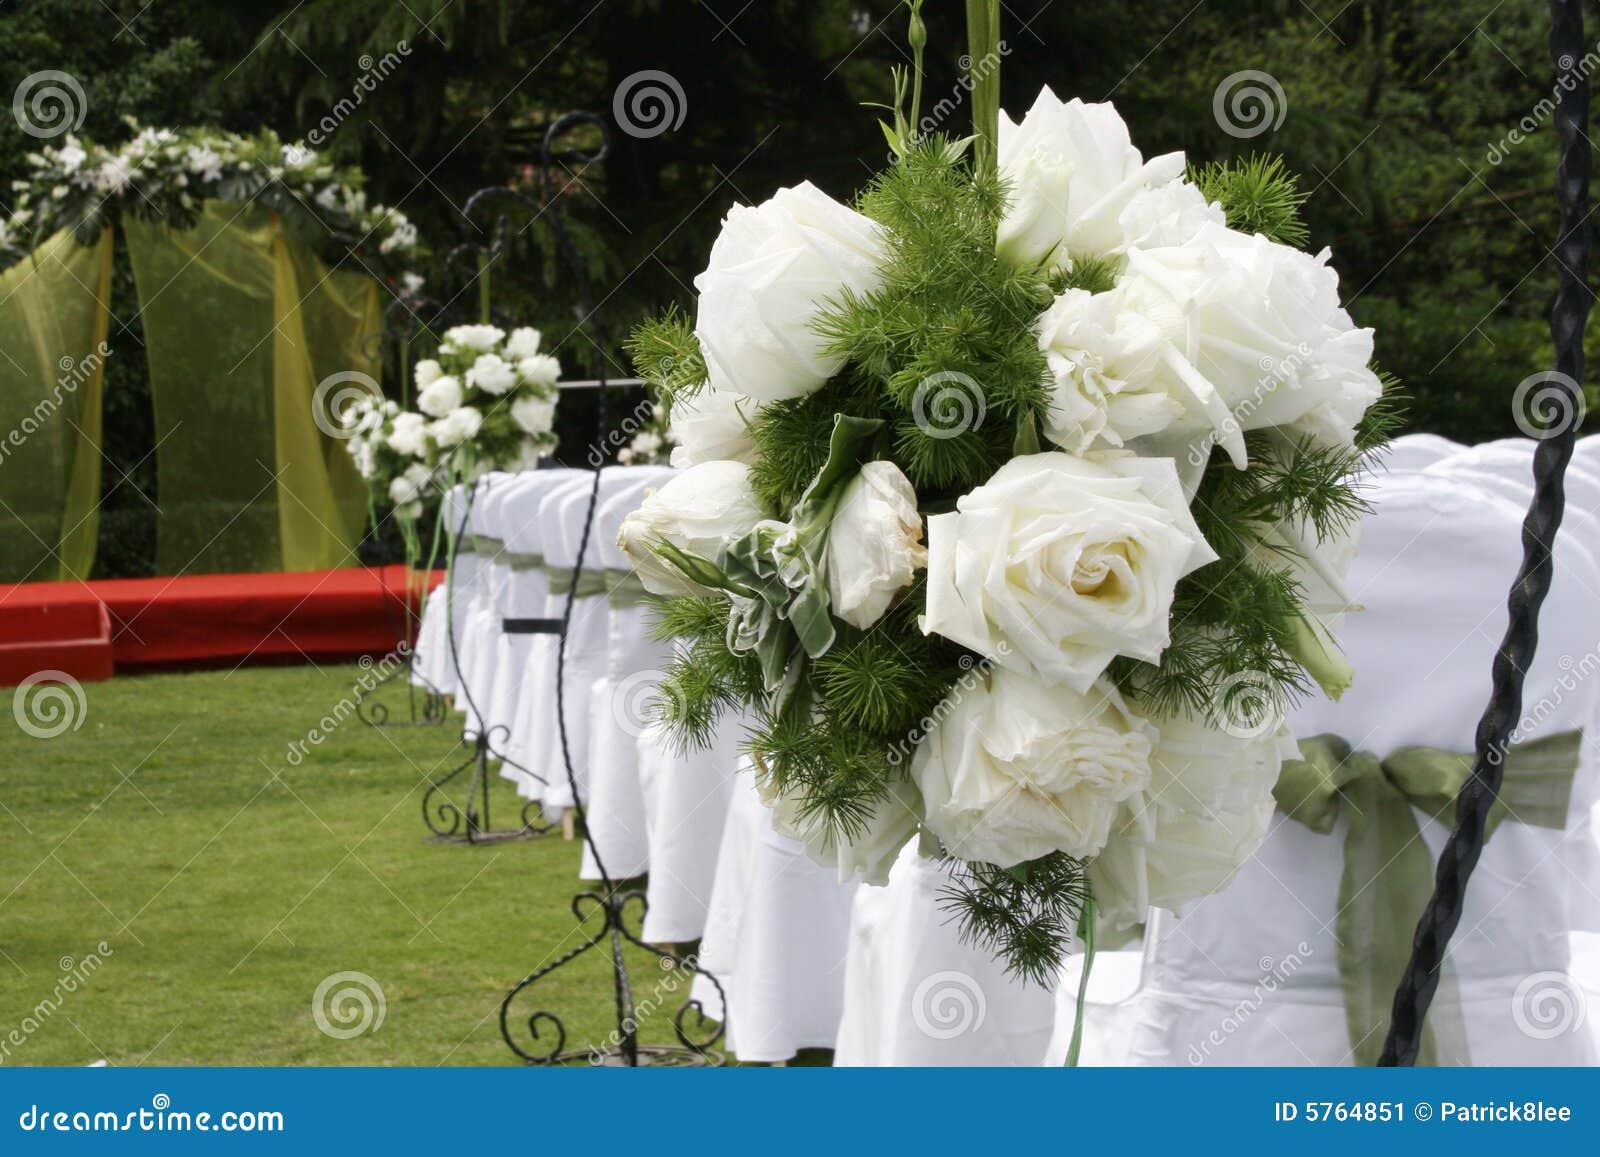 wedding reception flowers stock image image 5764851. Black Bedroom Furniture Sets. Home Design Ideas